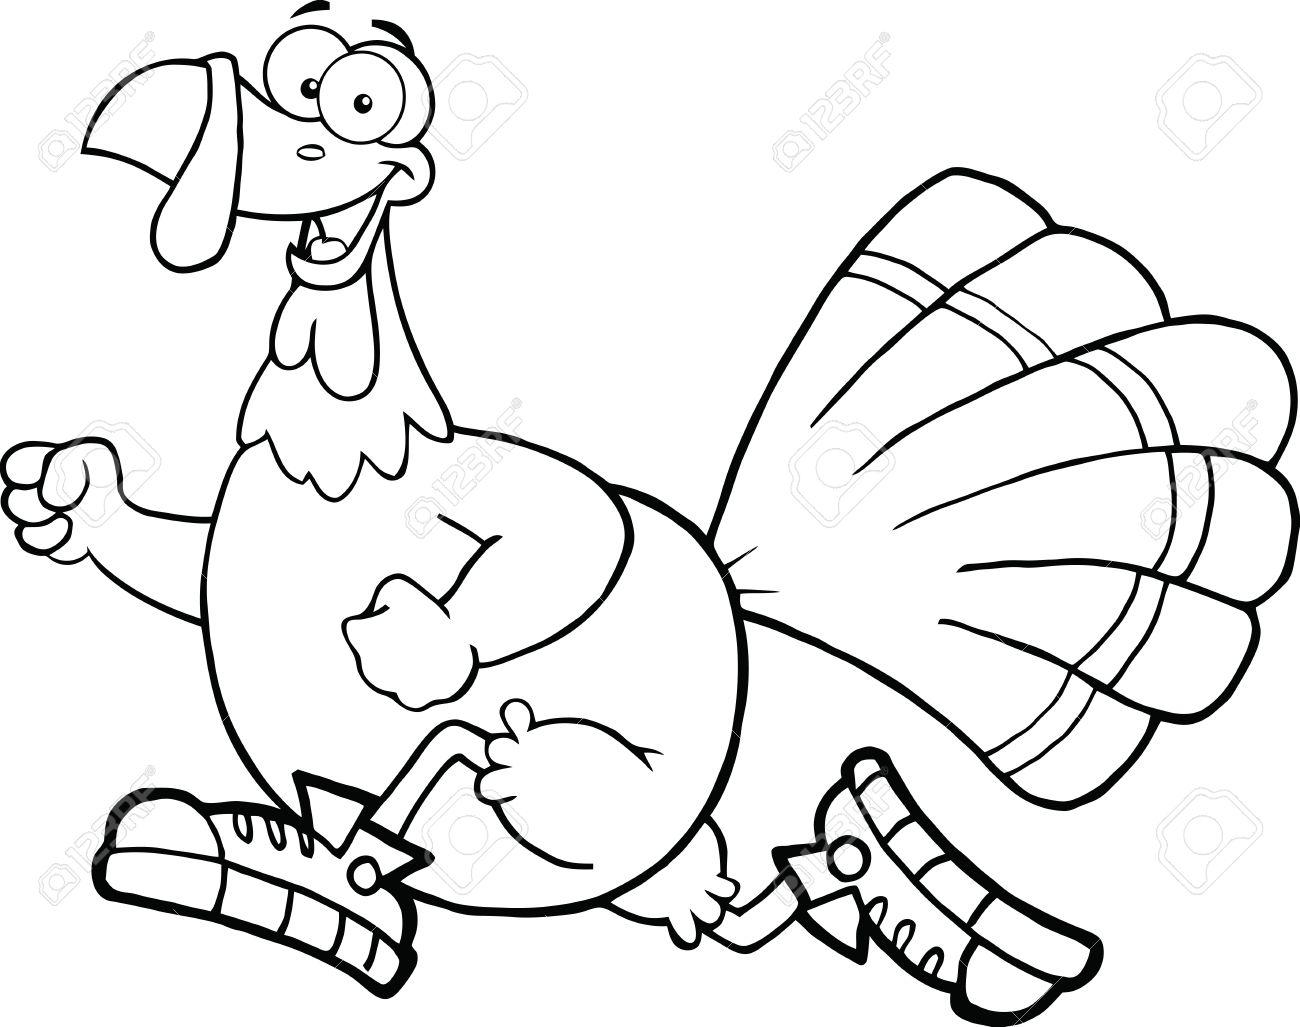 1300x1027 Black And White Happy Turkey Bird Cartoon Character Jogging